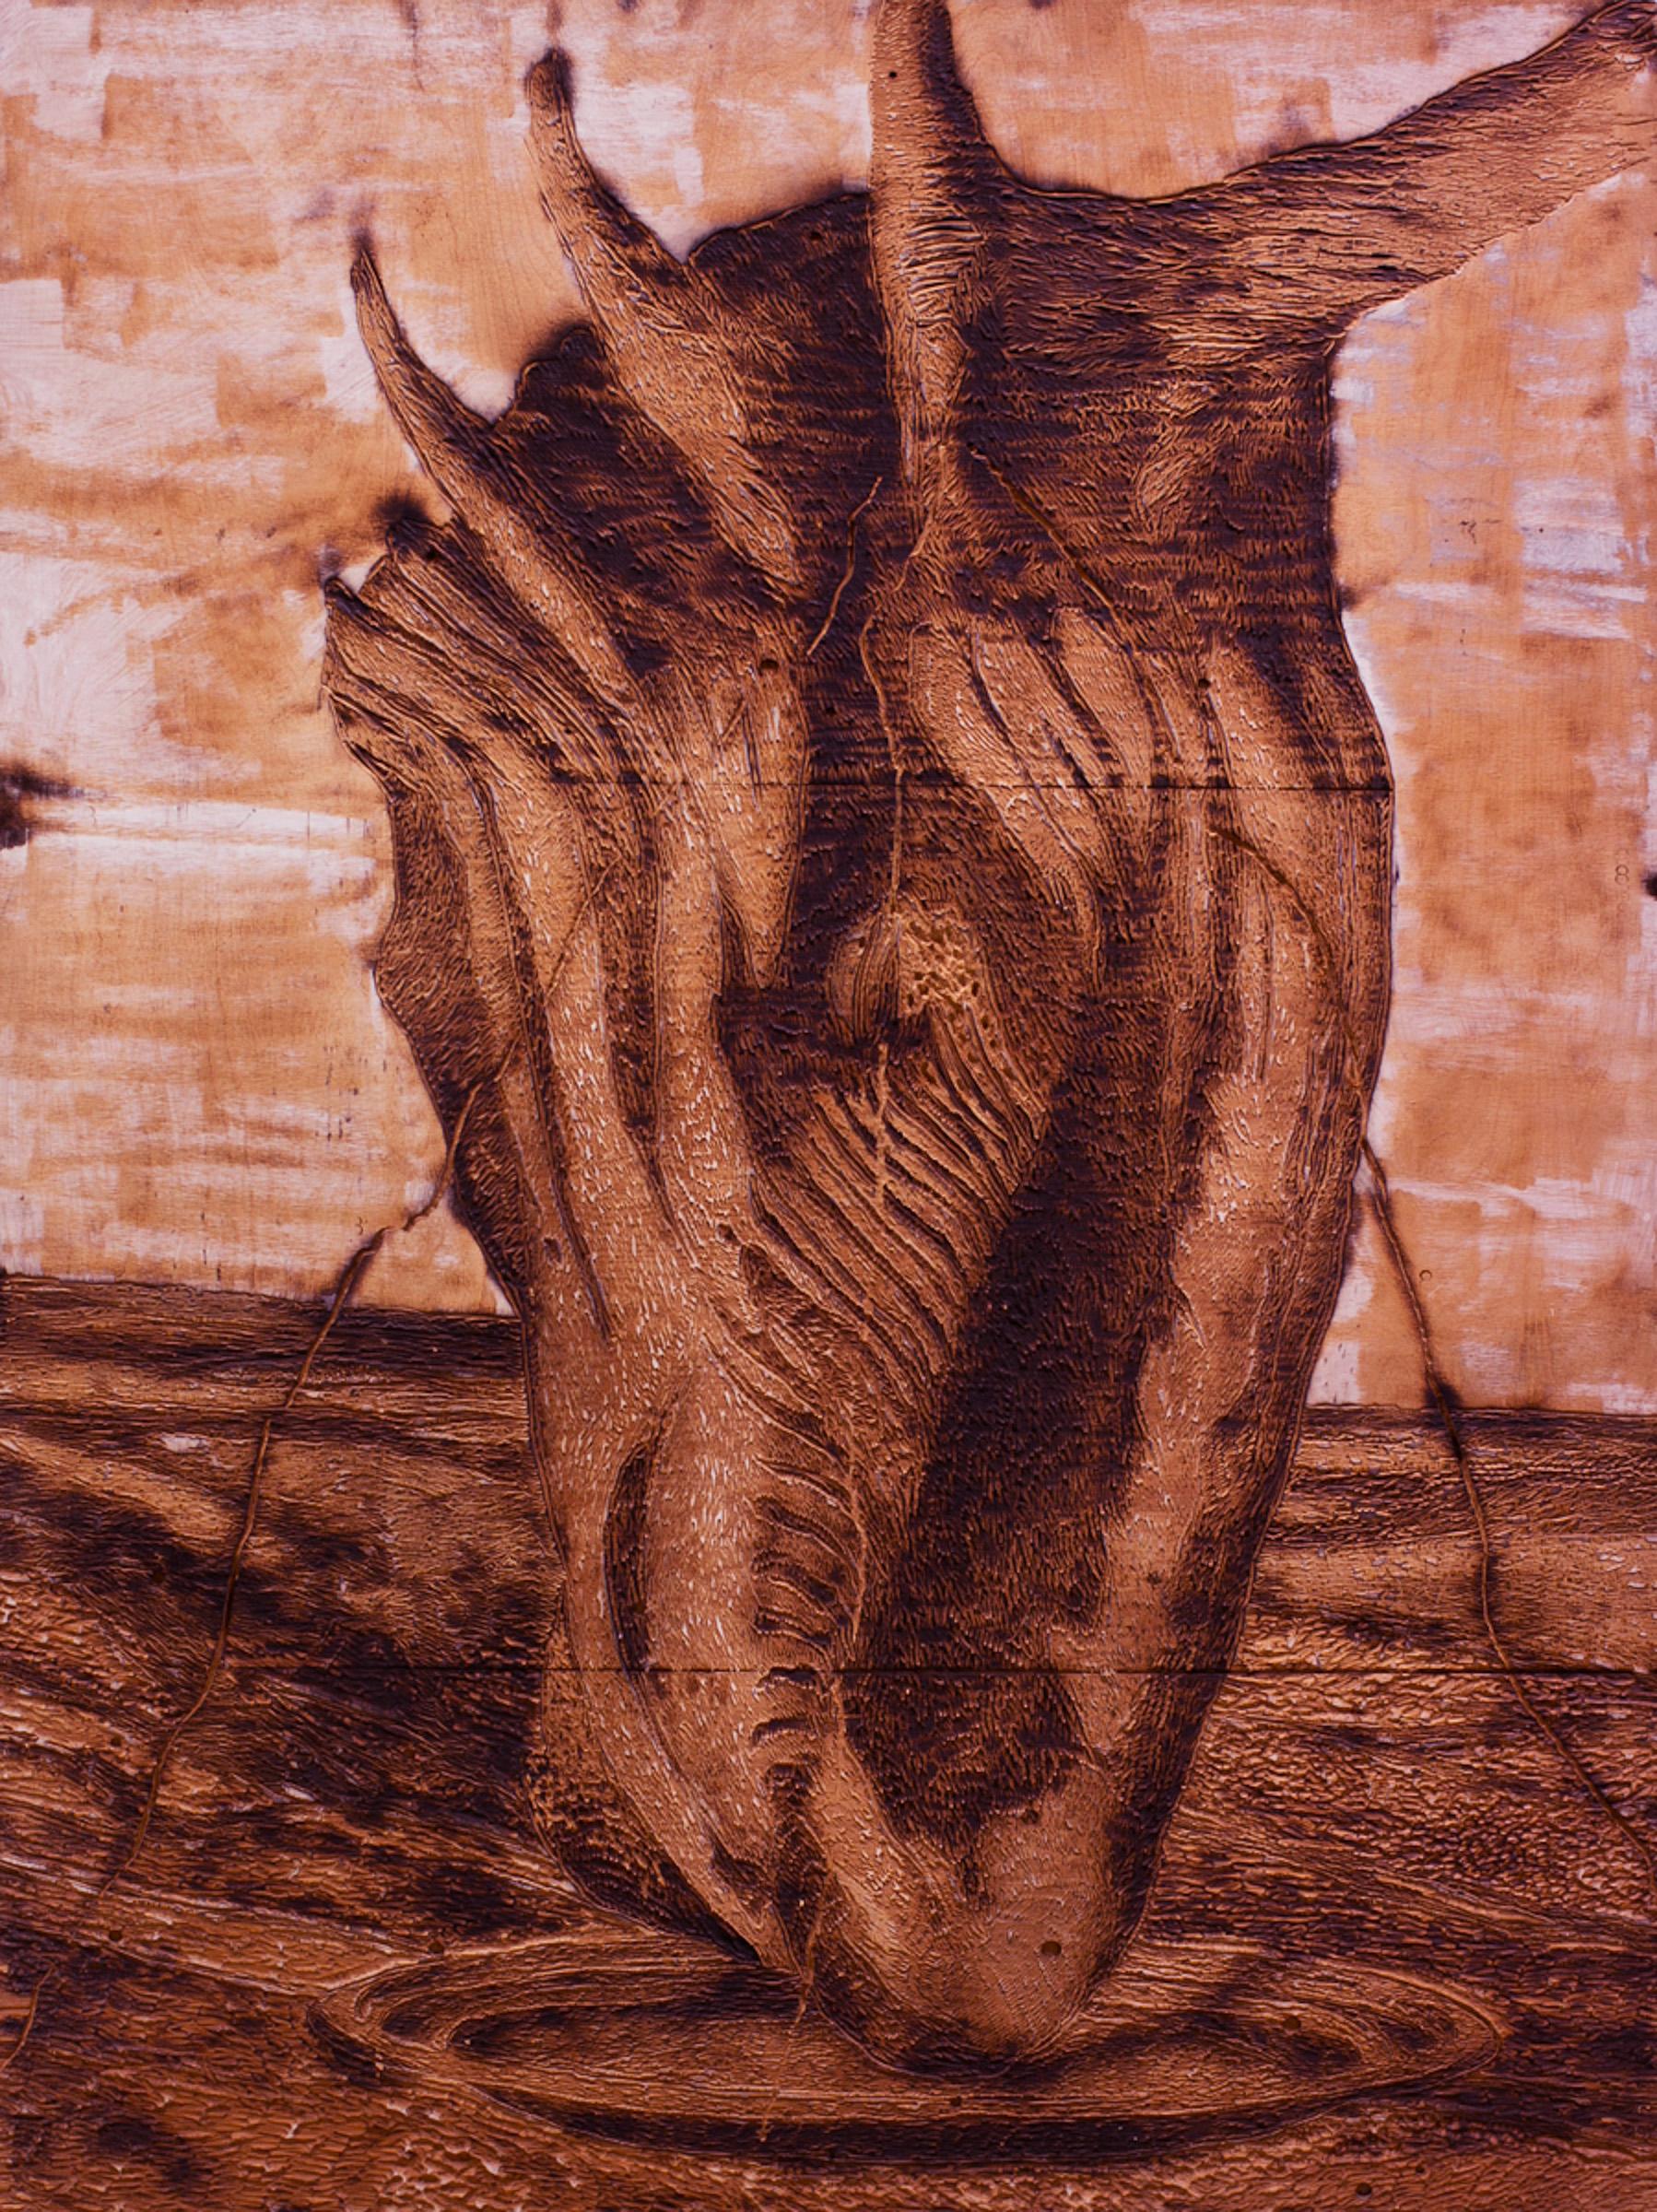 Giants & Dwarfs Paintings